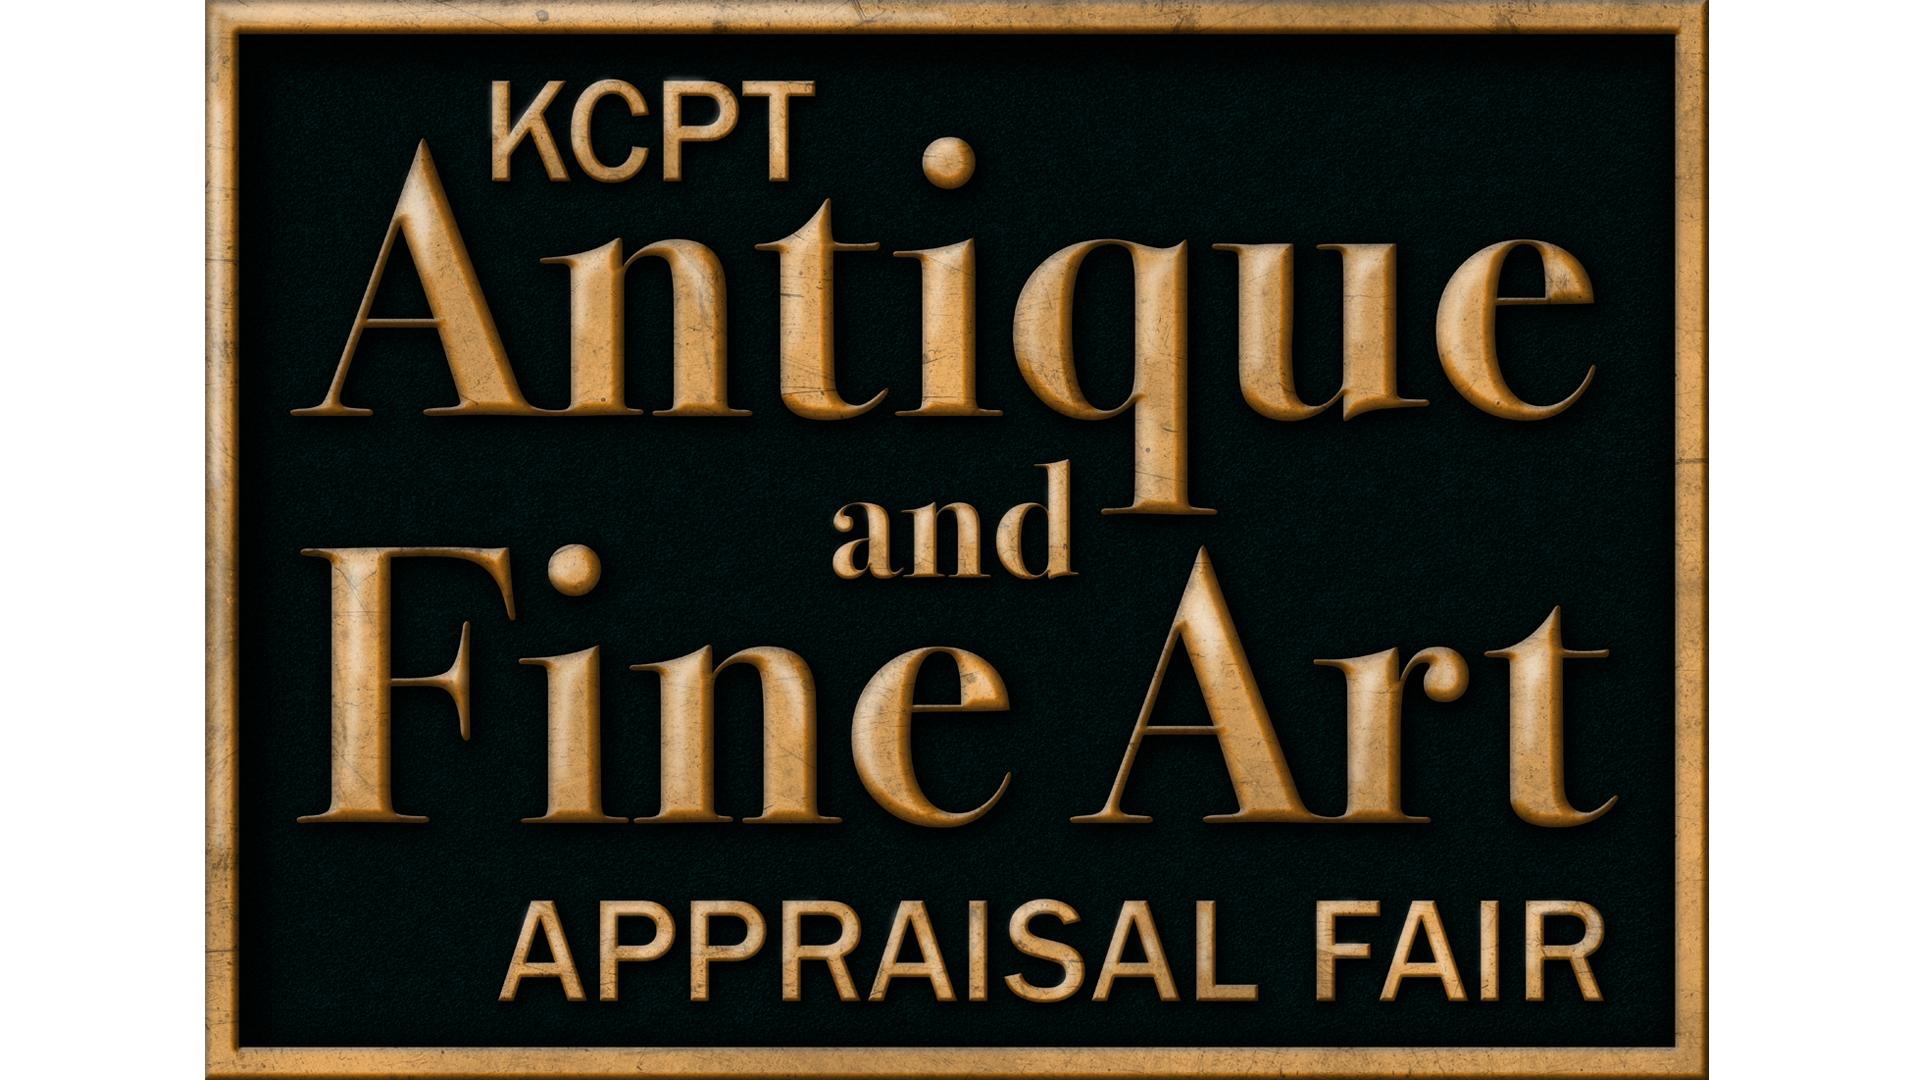 KCPT Antique and Fine Art Appraisal Fair